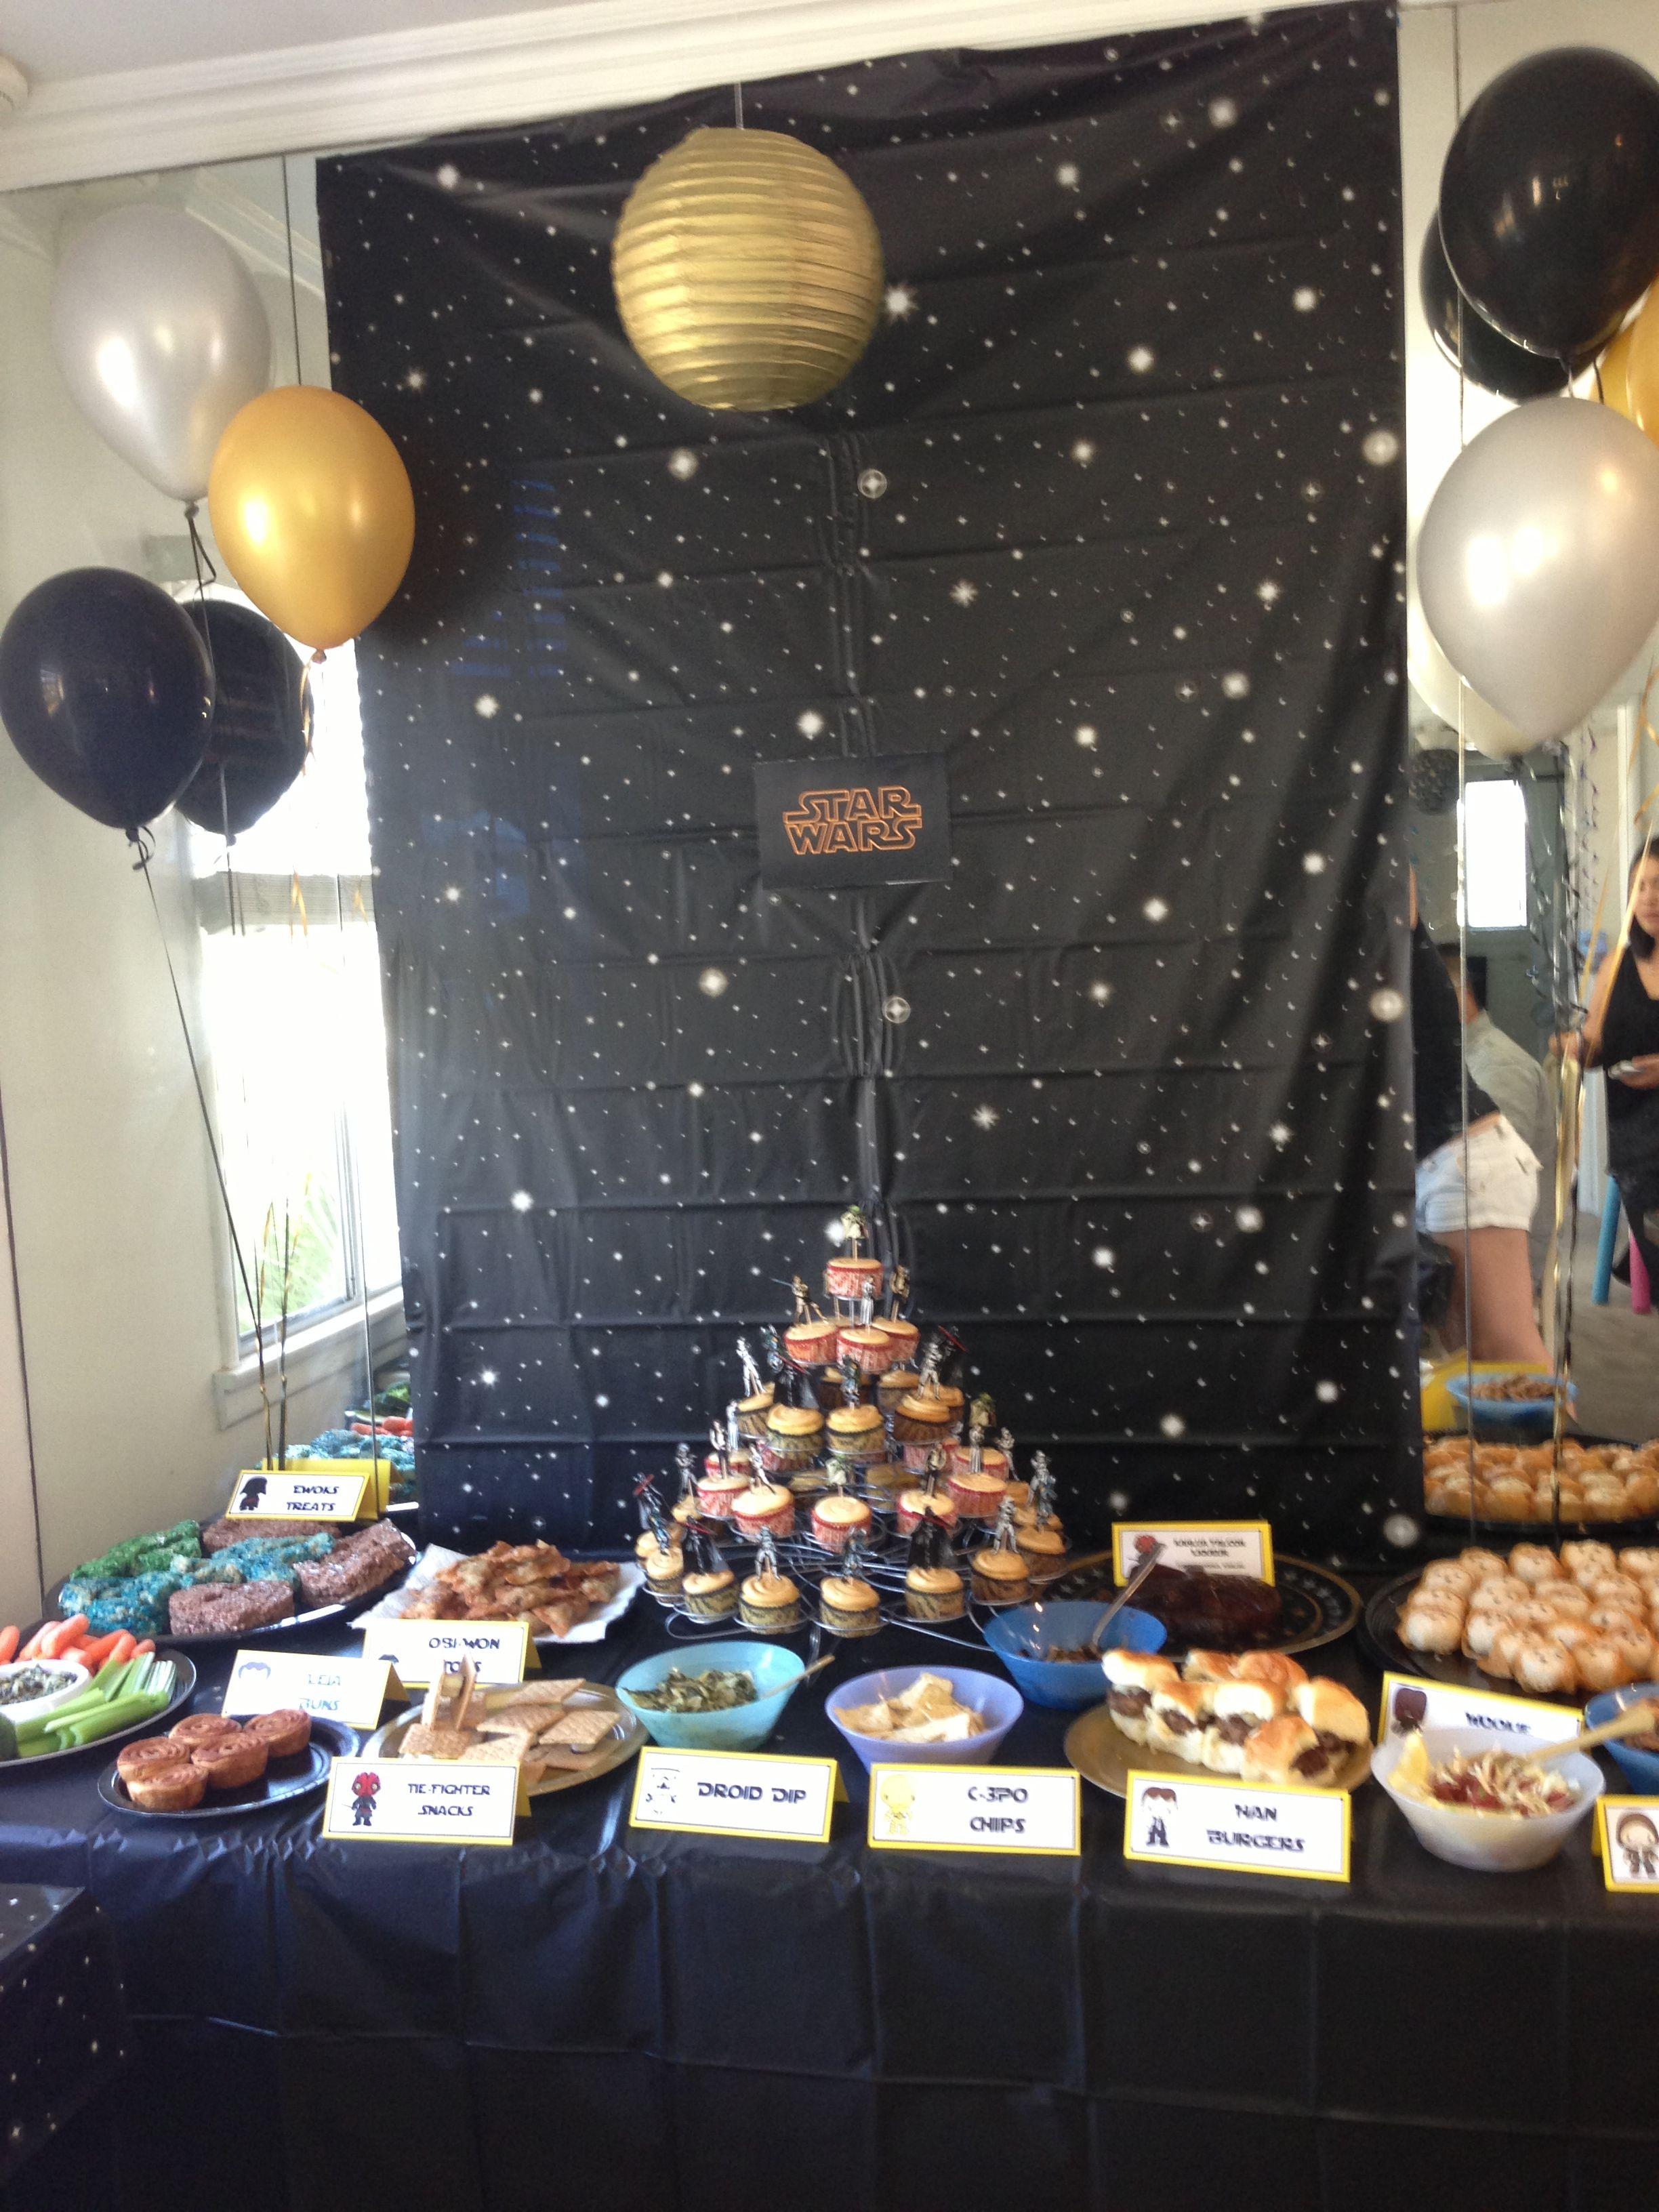 Star Wars theme 30th birthday party